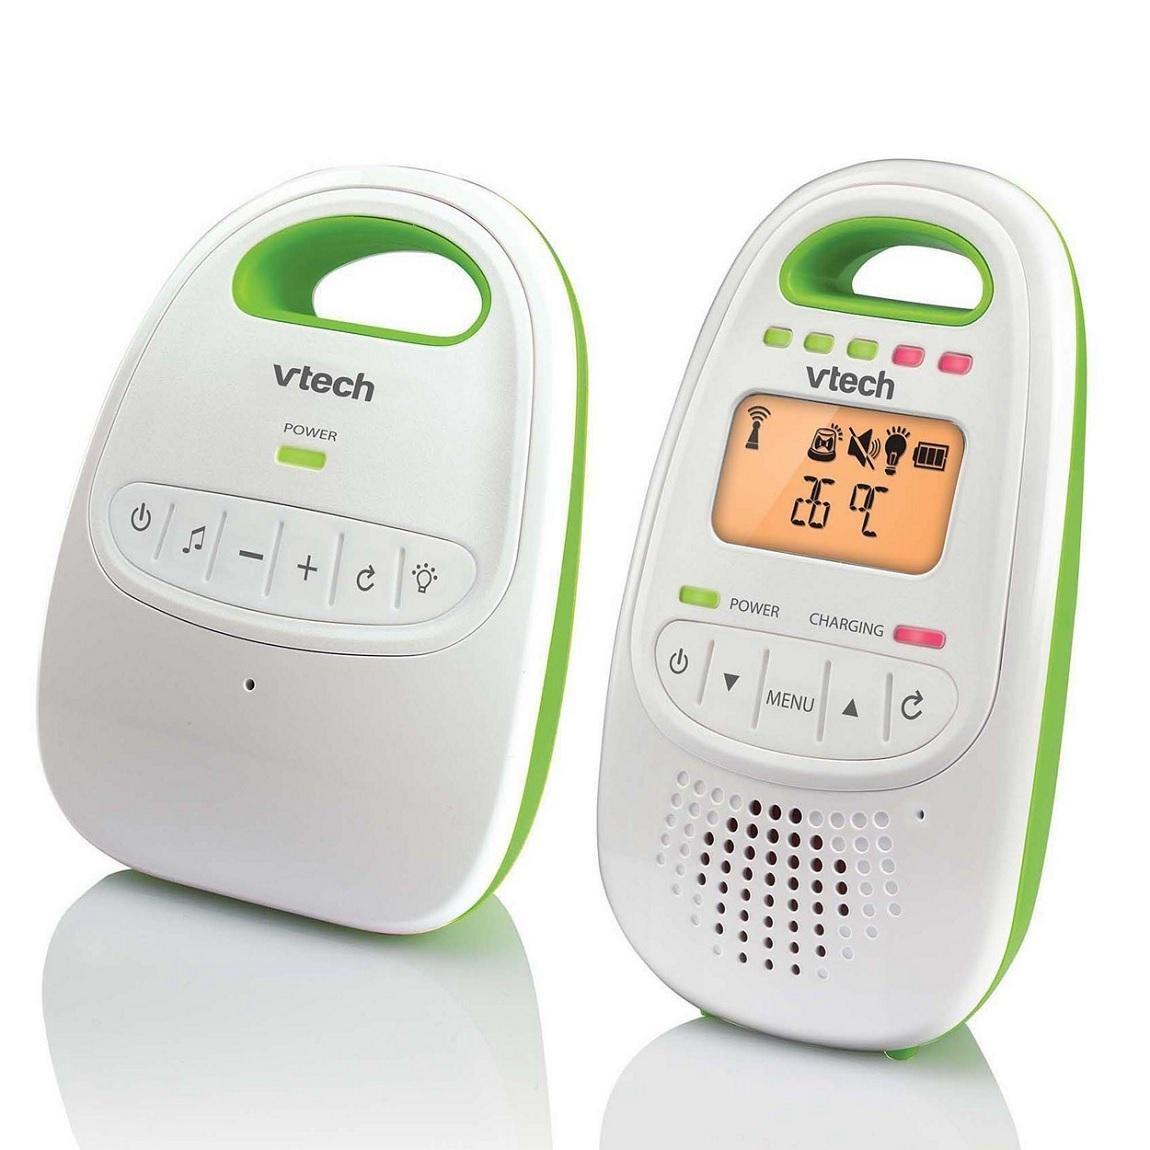 Vtech-BM2000-baby-monitor.jpg